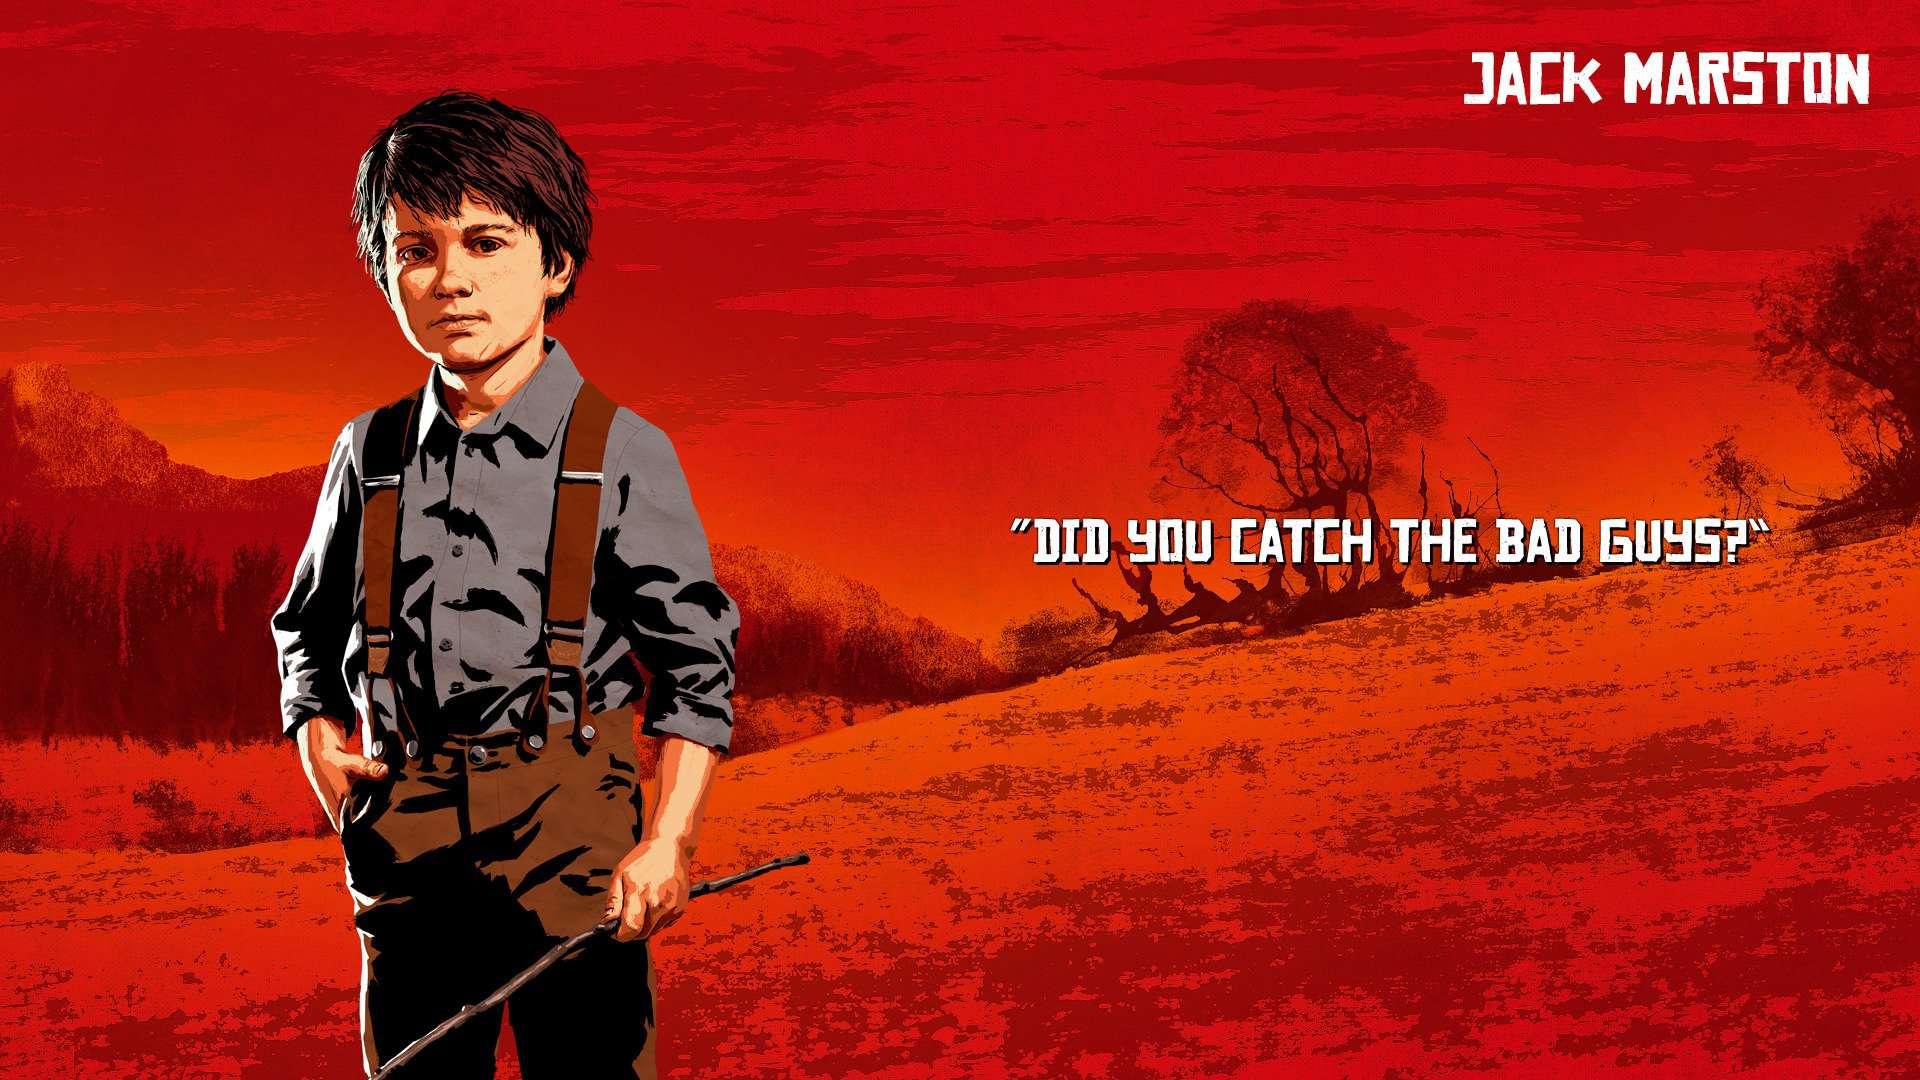 Jack Marston Red Dead Redemption 2 Wiki Rdr2 Org 1,911 отметок «нравится», 92 комментариев — josh blaylock (@blaylockphoto) в instagram: jack marston red dead redemption 2